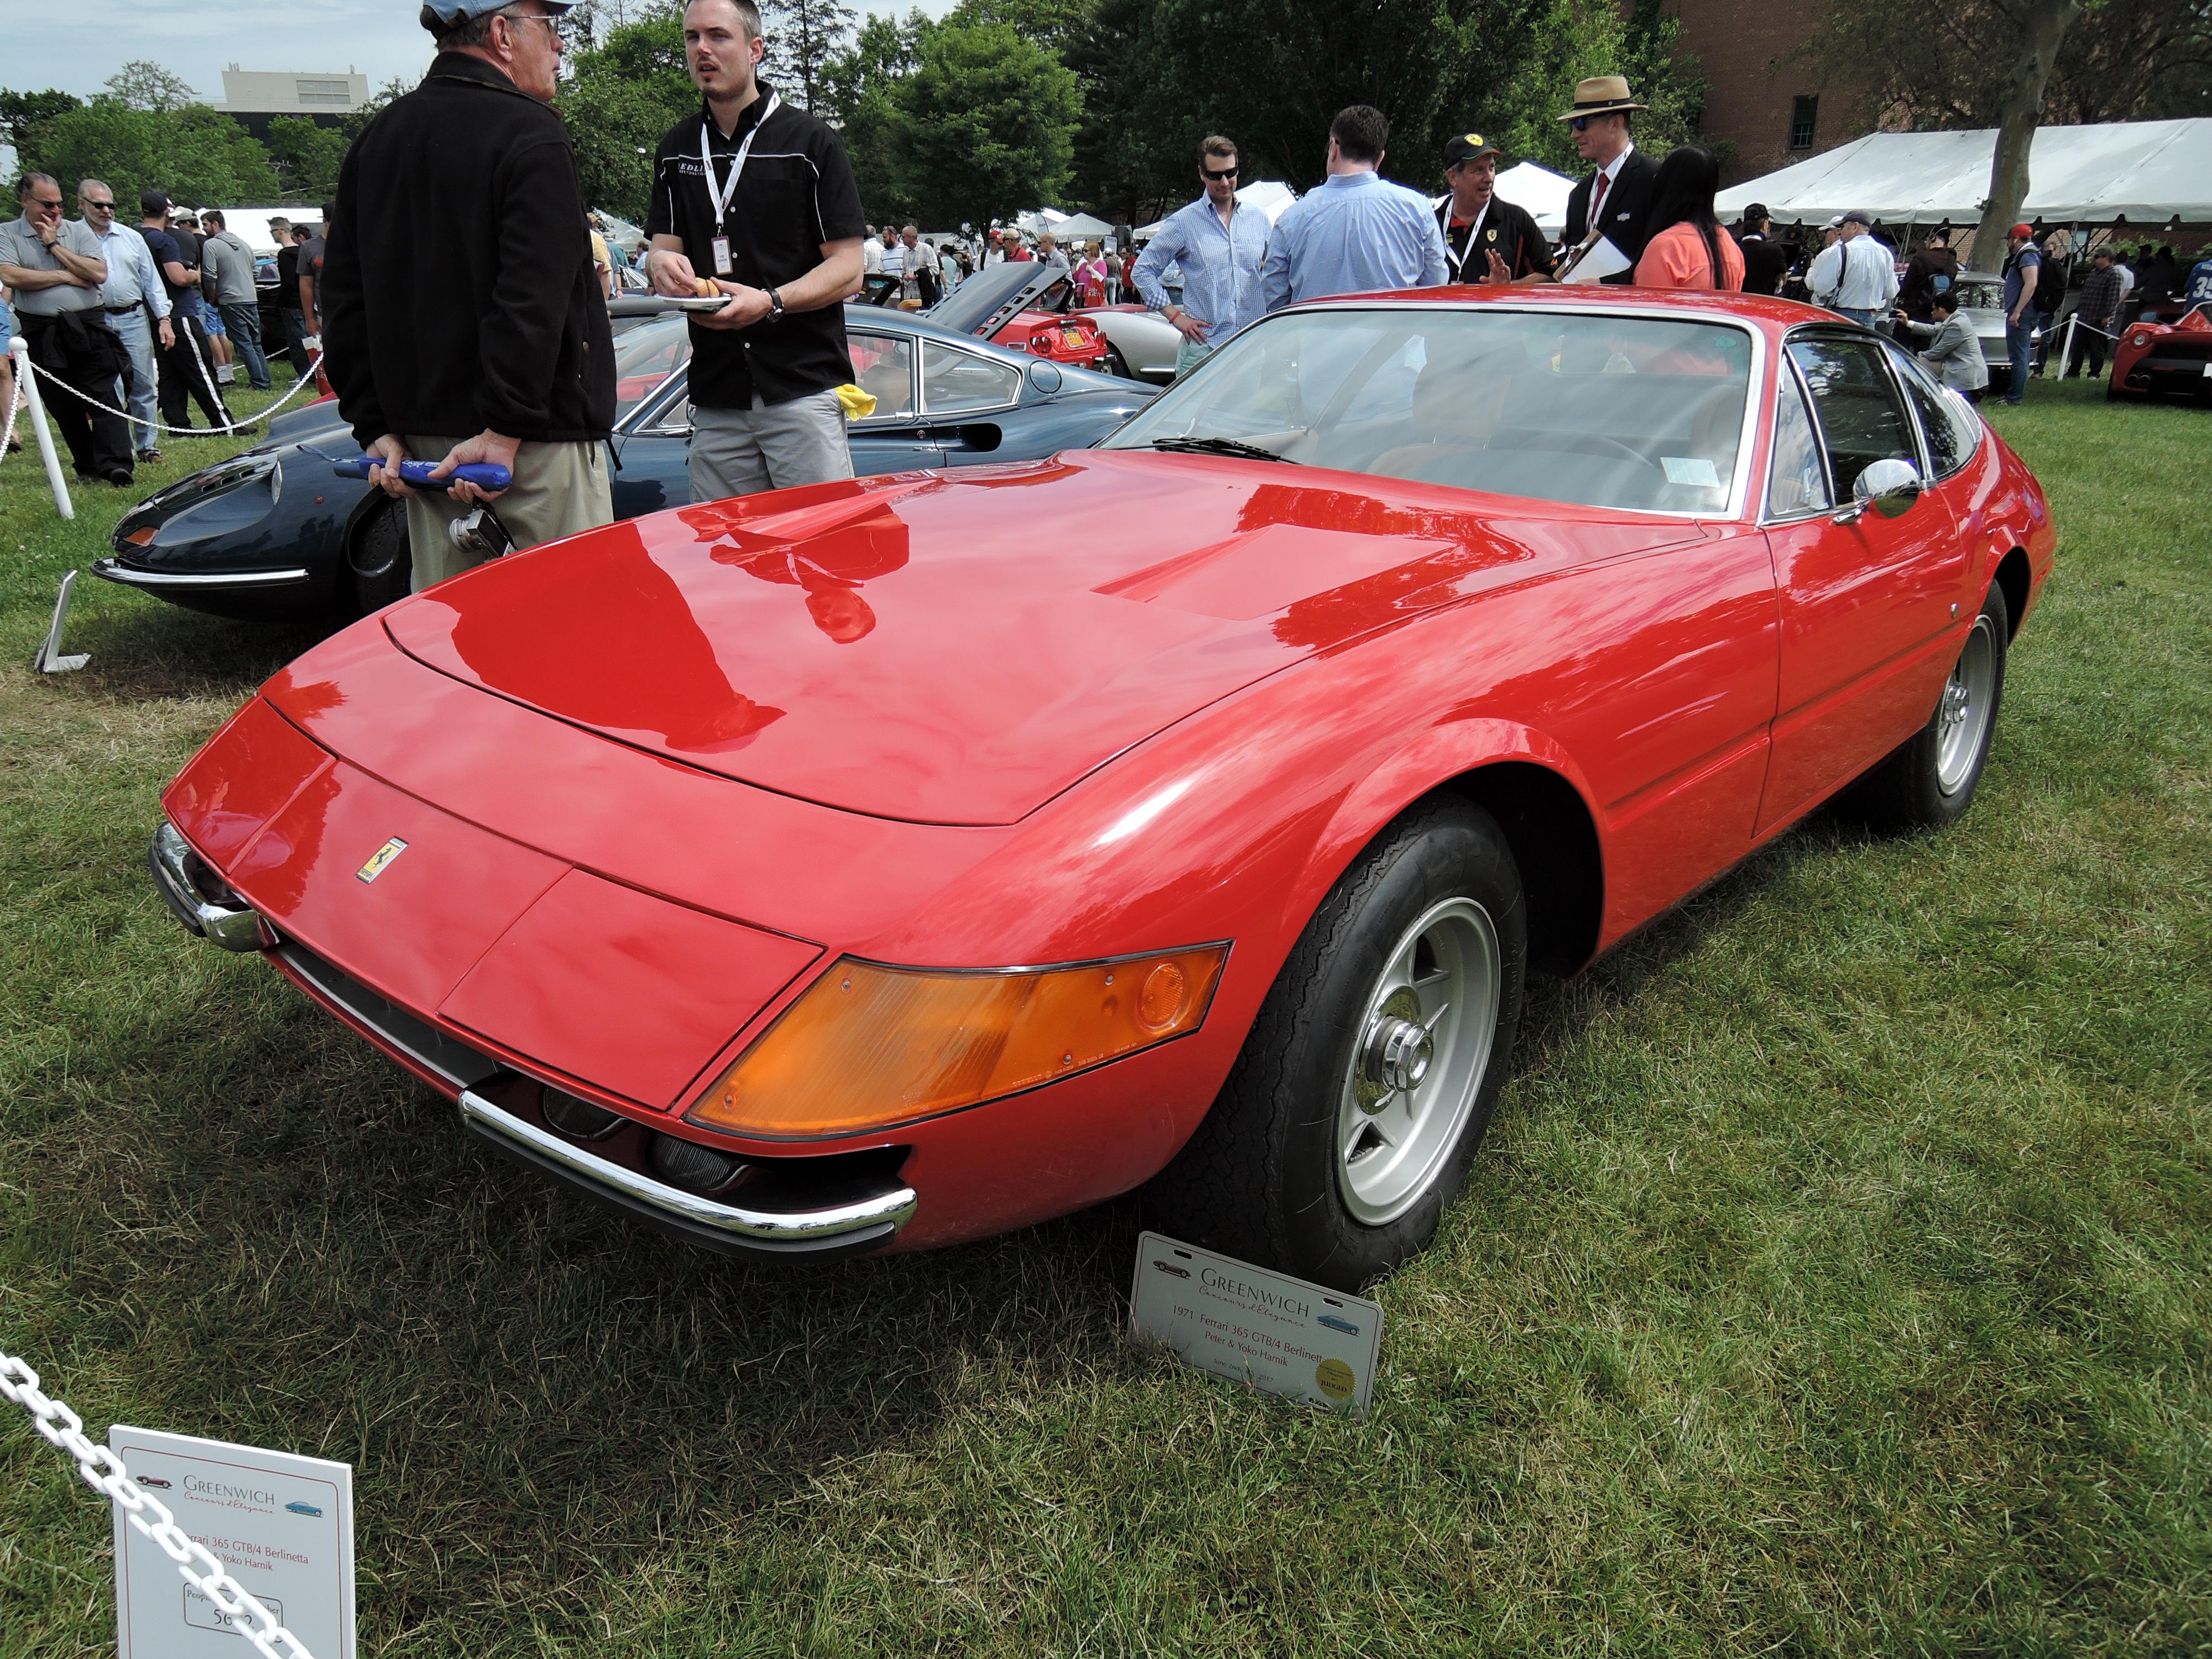 red 1971 Ferrari 365 GTB/4 Berlinetta - Greenwich Concours d'Elegance 2017